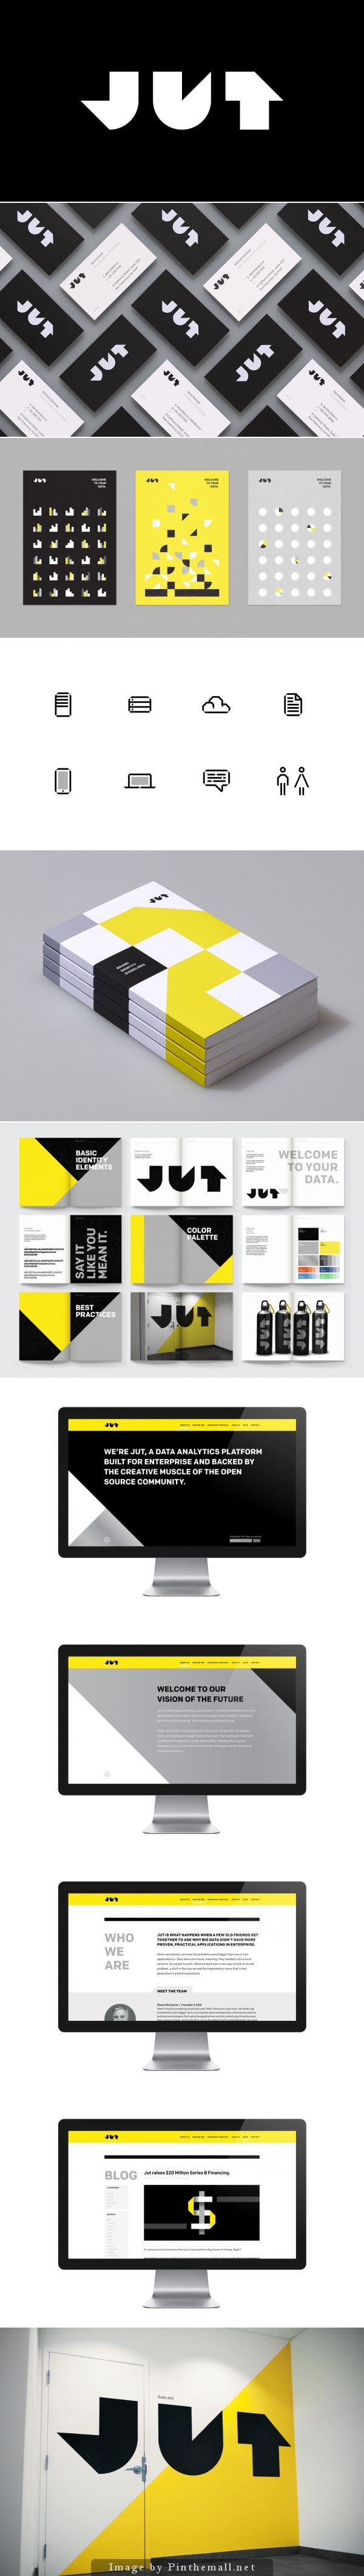 #identity #design #branding #corporate